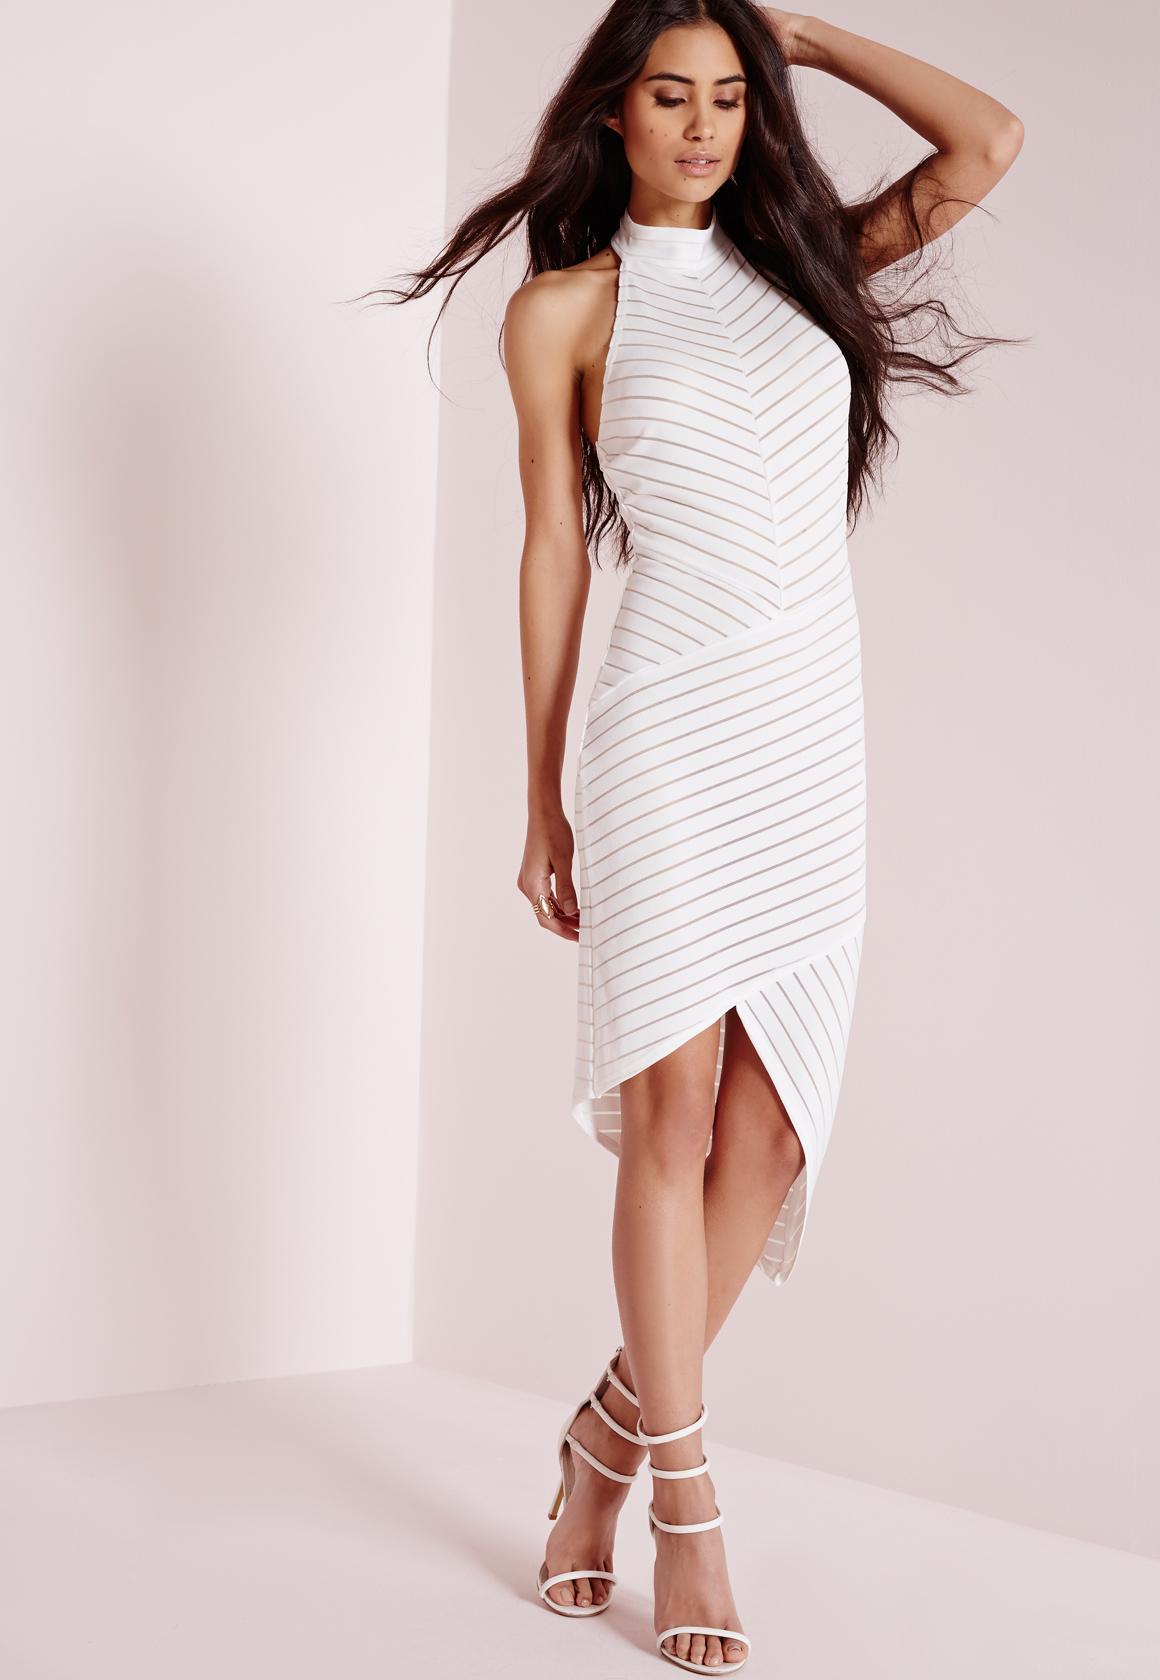 Sleeveless Collarless Dresses Stripes Bodycon angeles penney